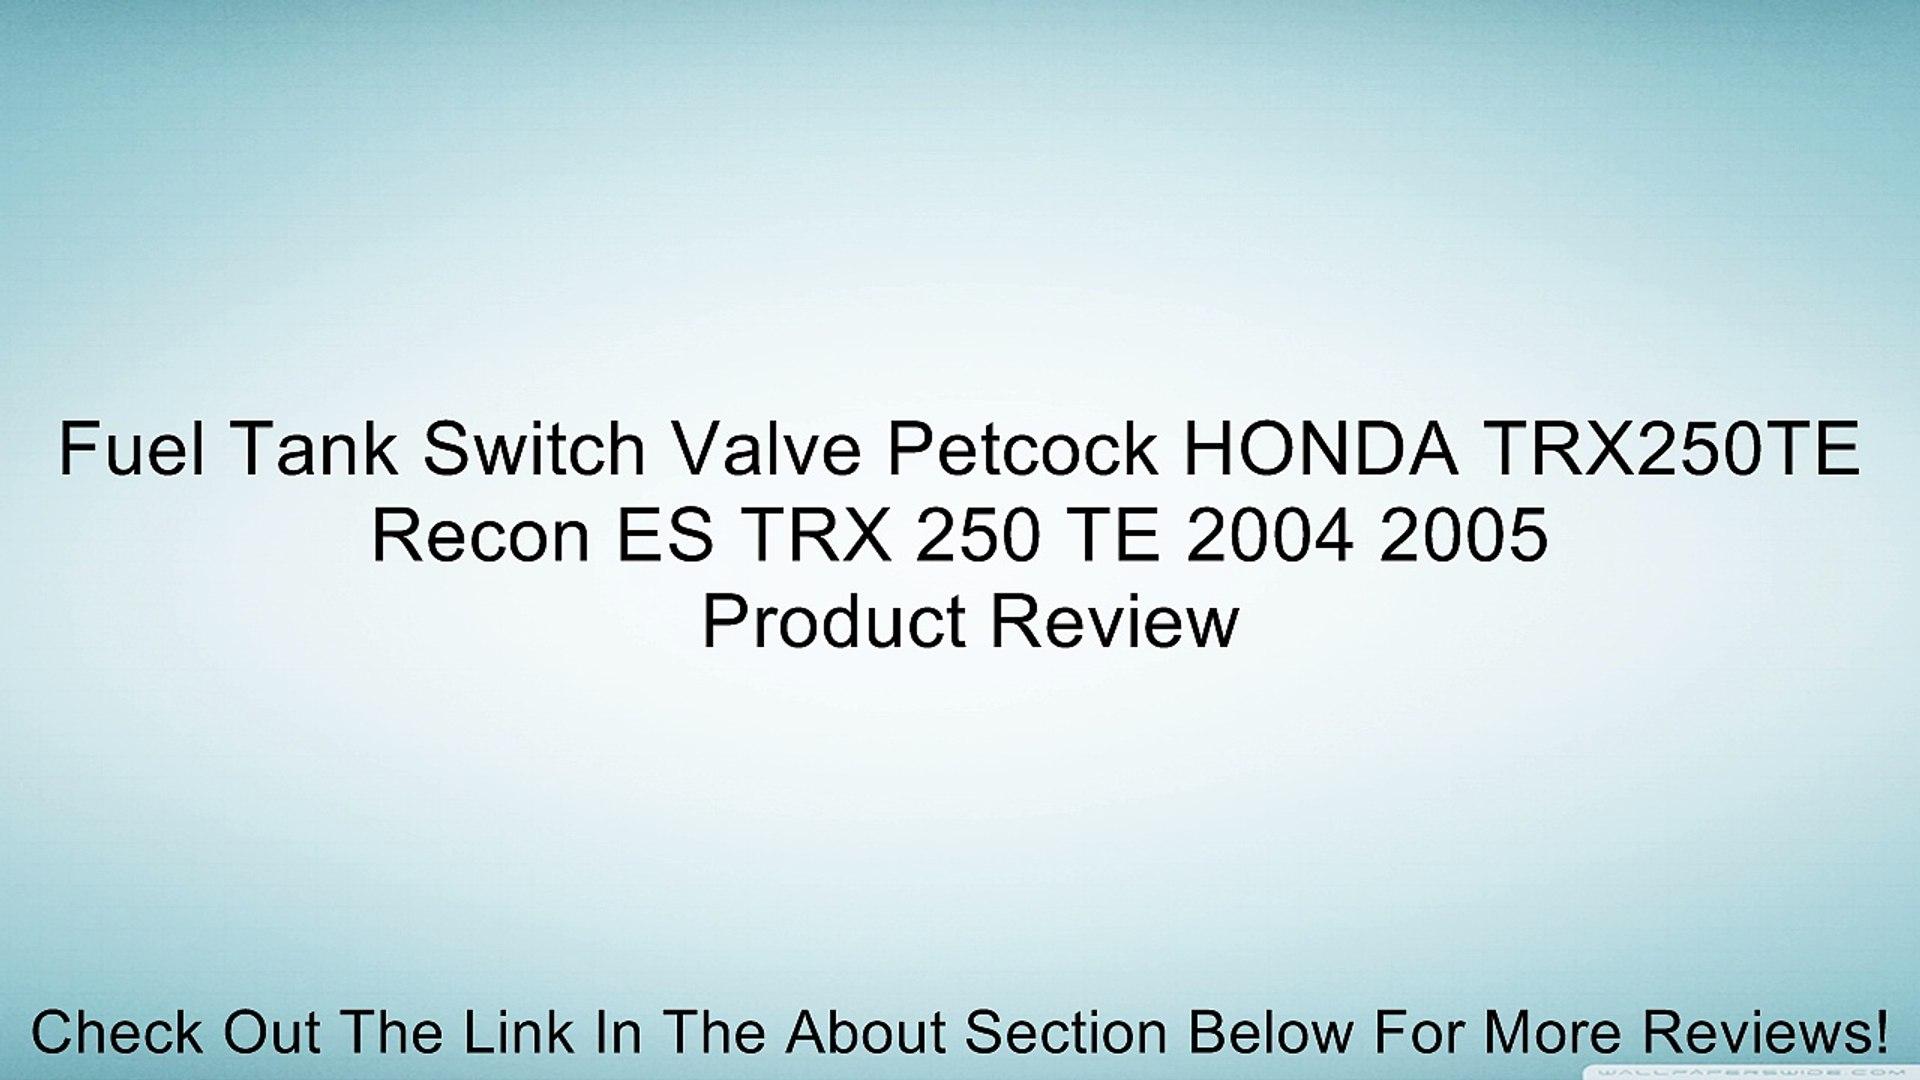 New Petcock Gas Fuel Tank Switch for HONDA TRX250EX Sportrax TRX 250 EX 2004 2005 2006